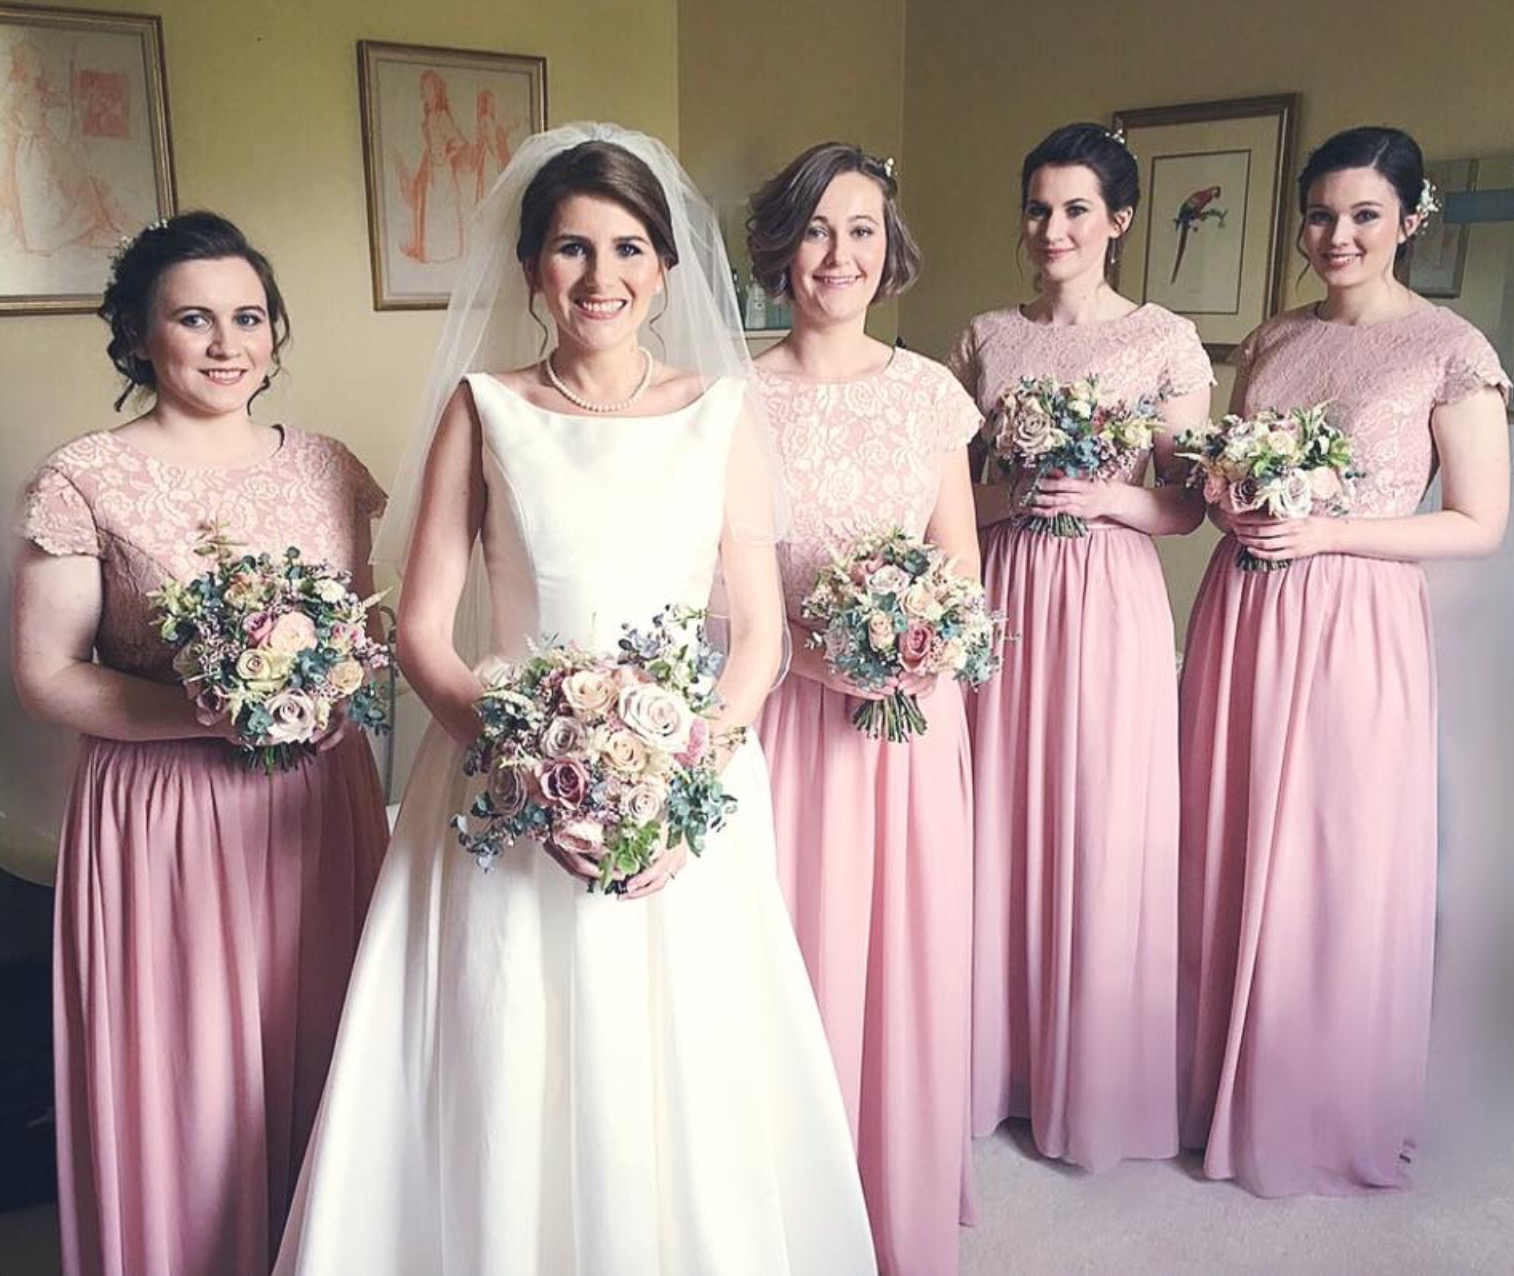 Shade Bridal - Lizzie's Real Wedding